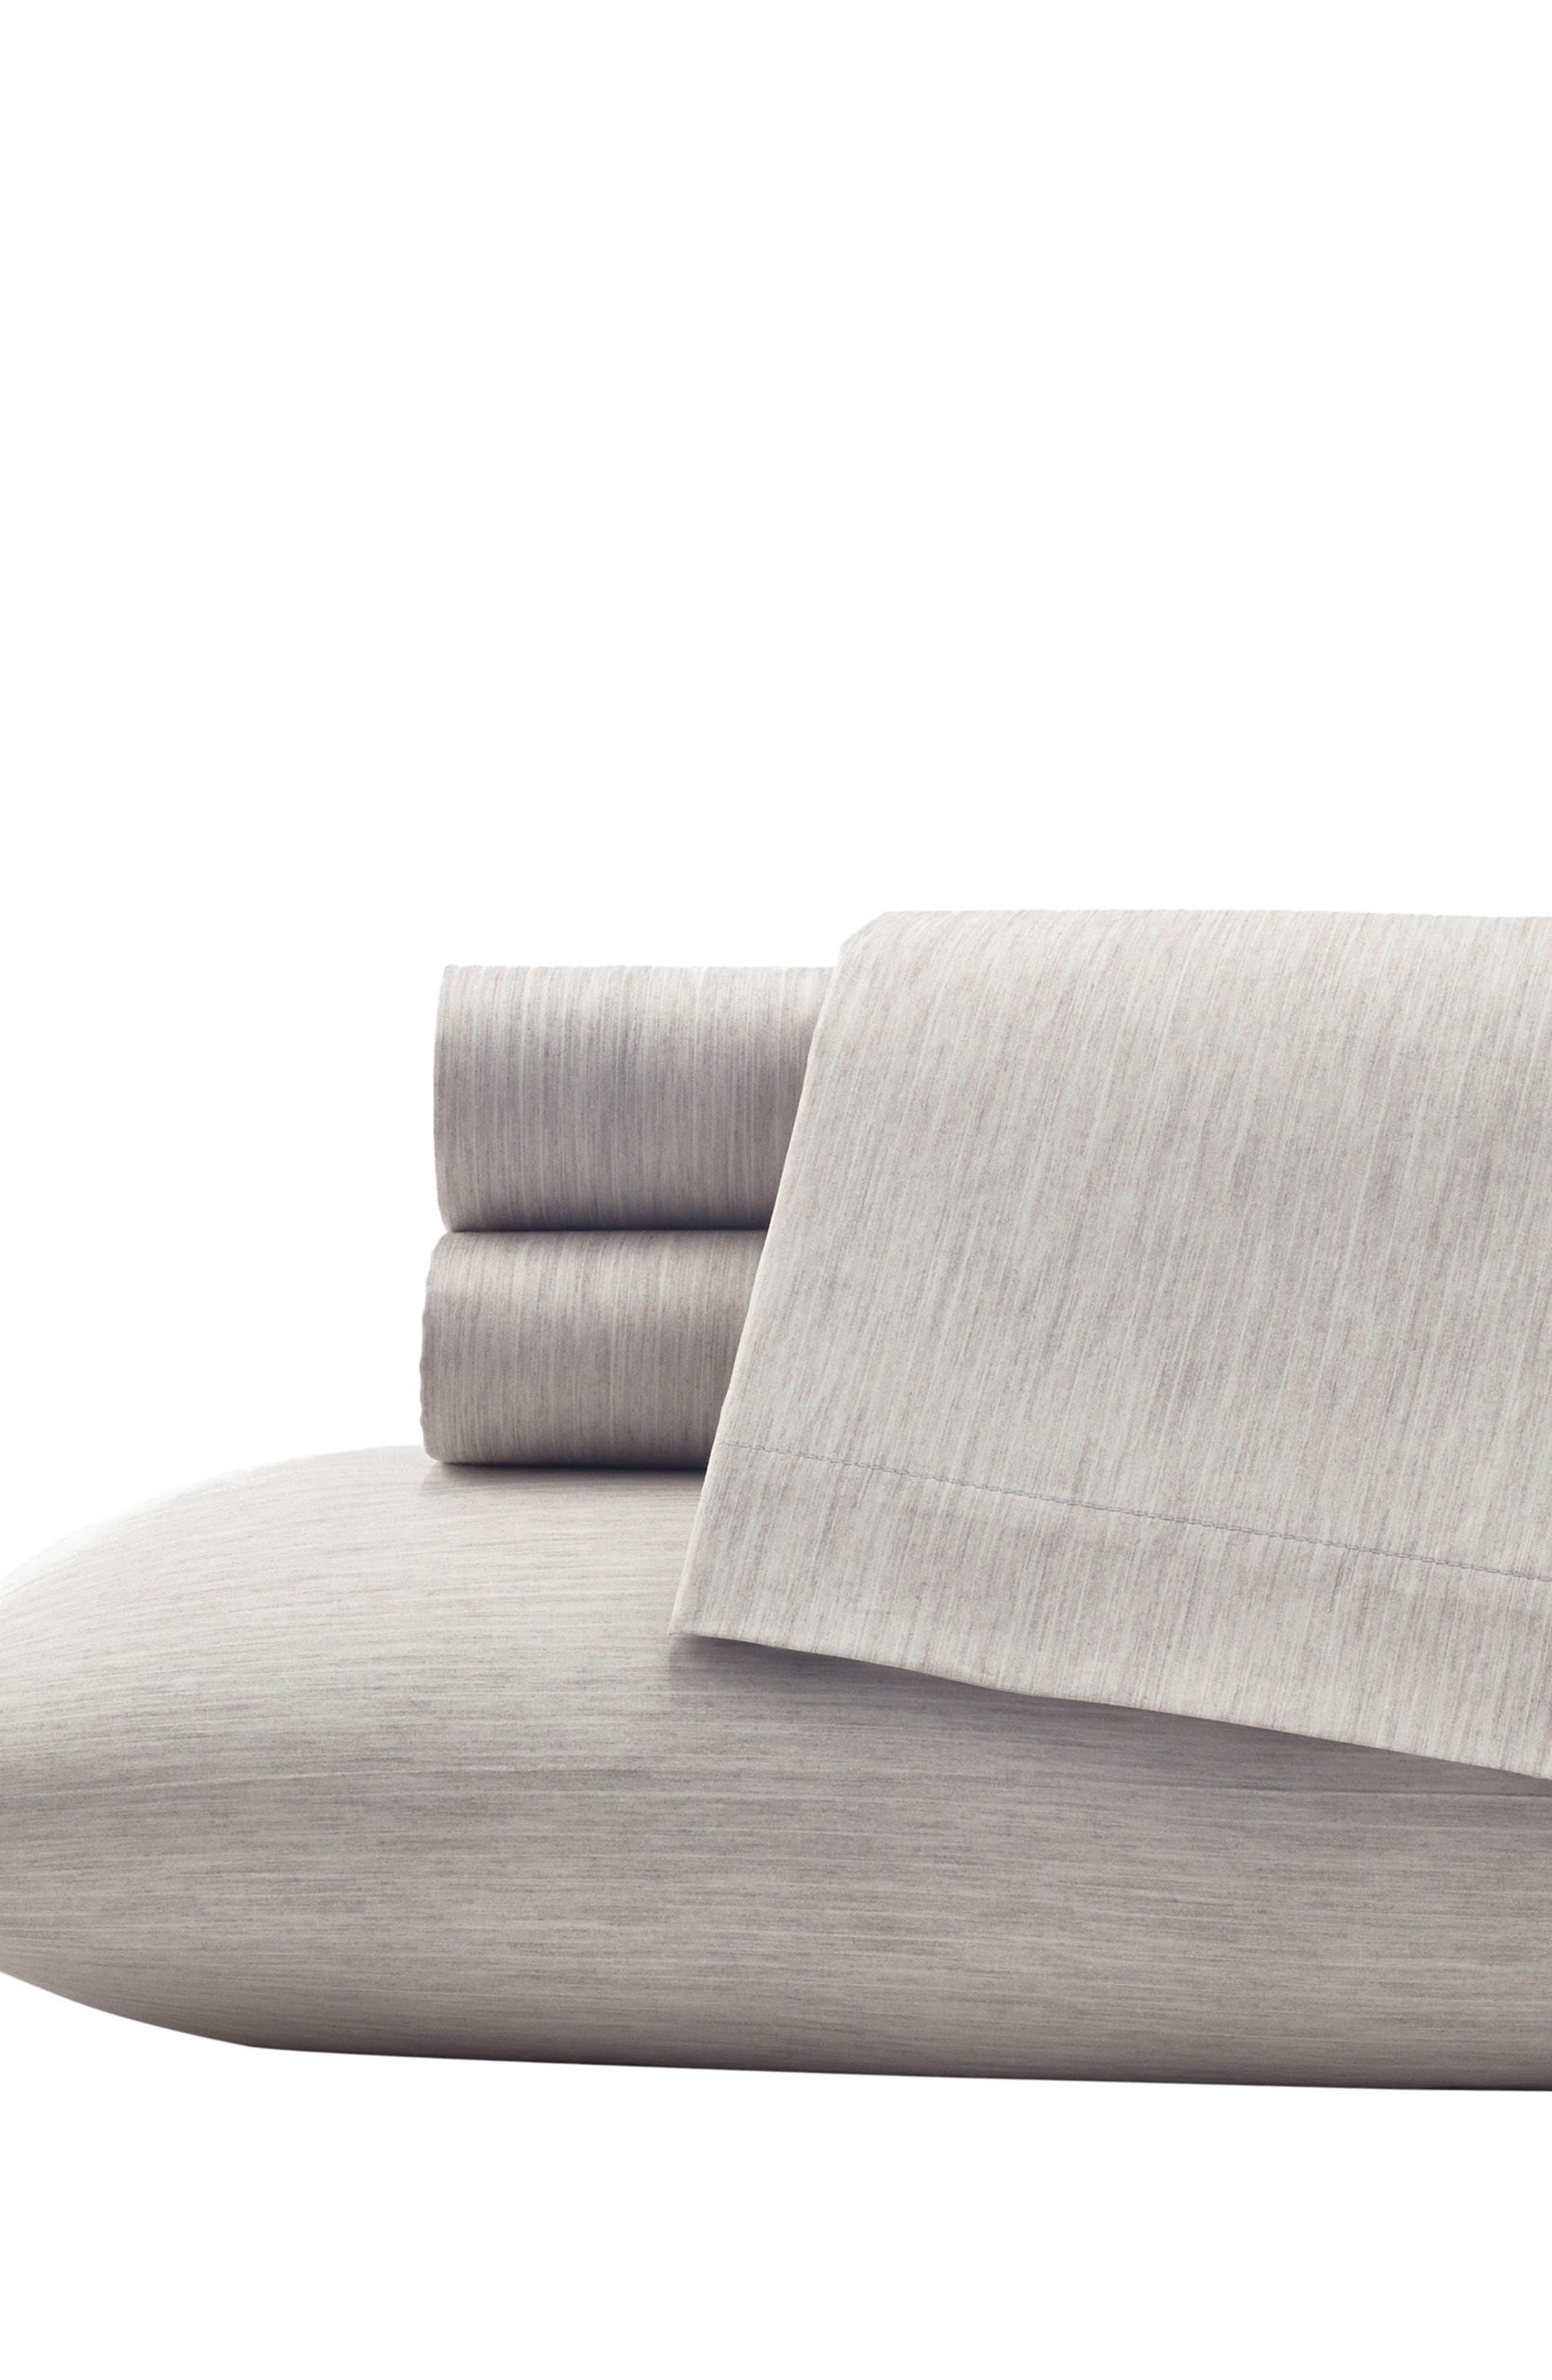 Vera Wang Marble Shibori 300 Thread Count Pillowcases